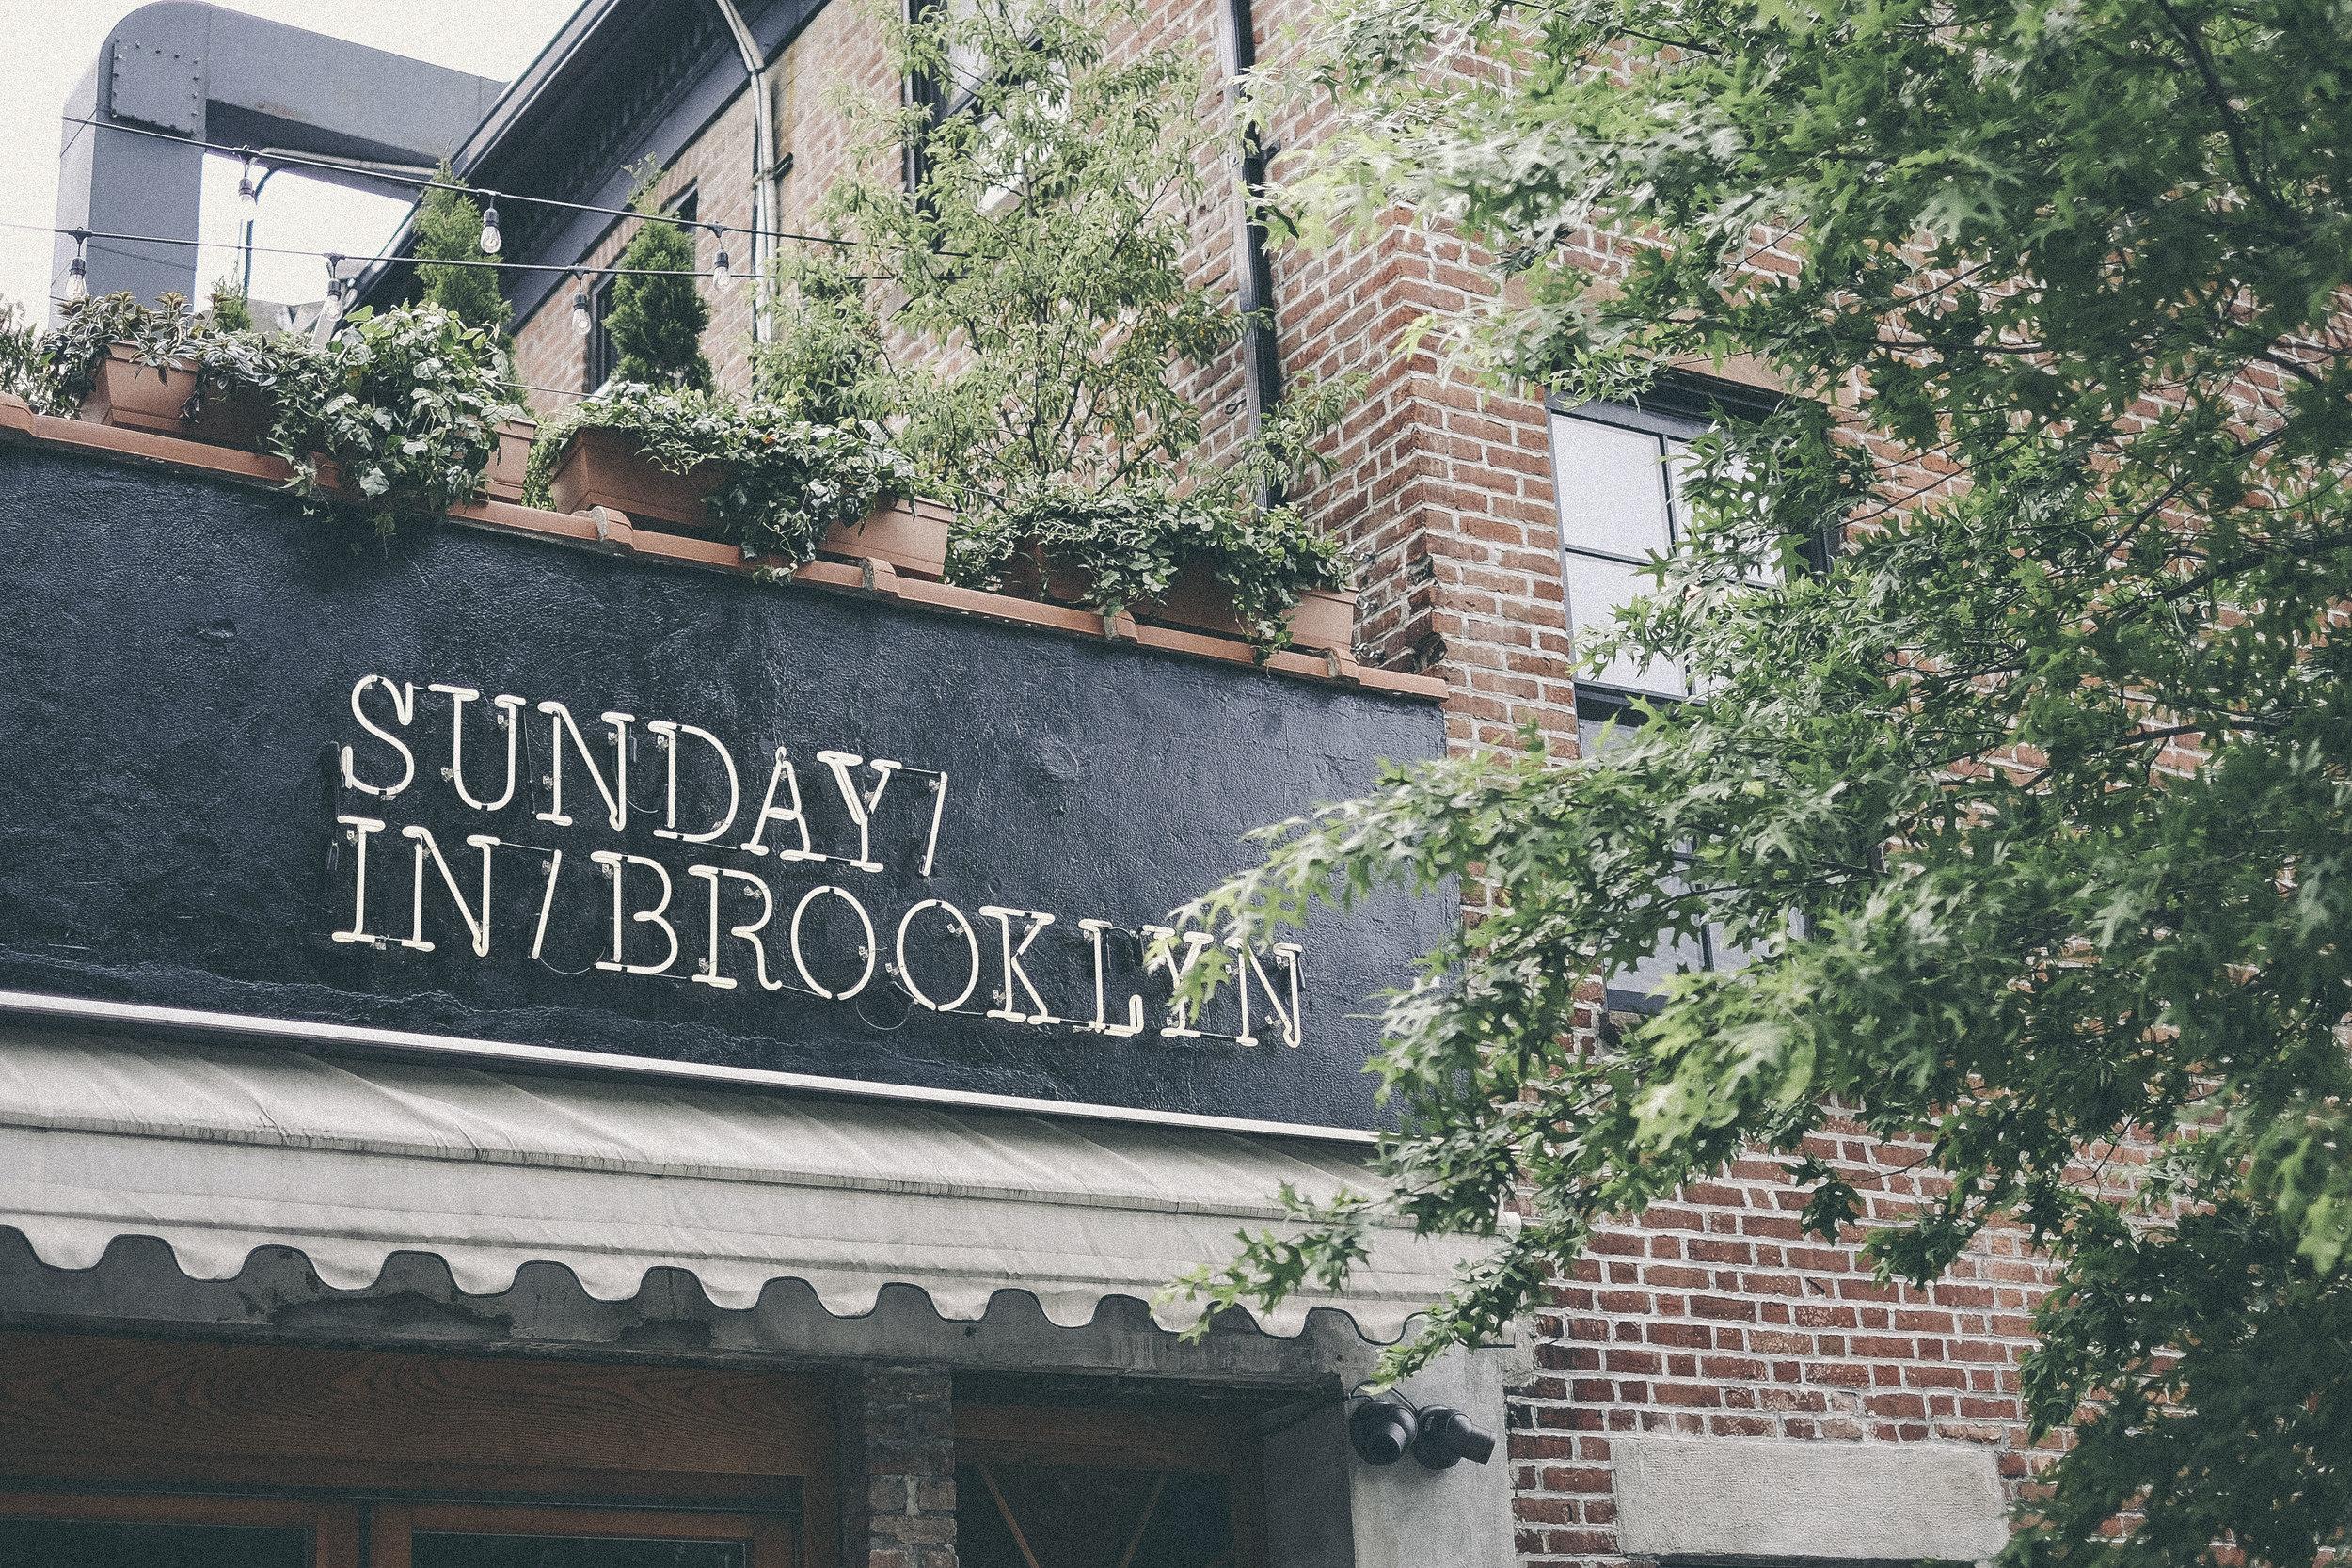 sunday in brooklyn, new york